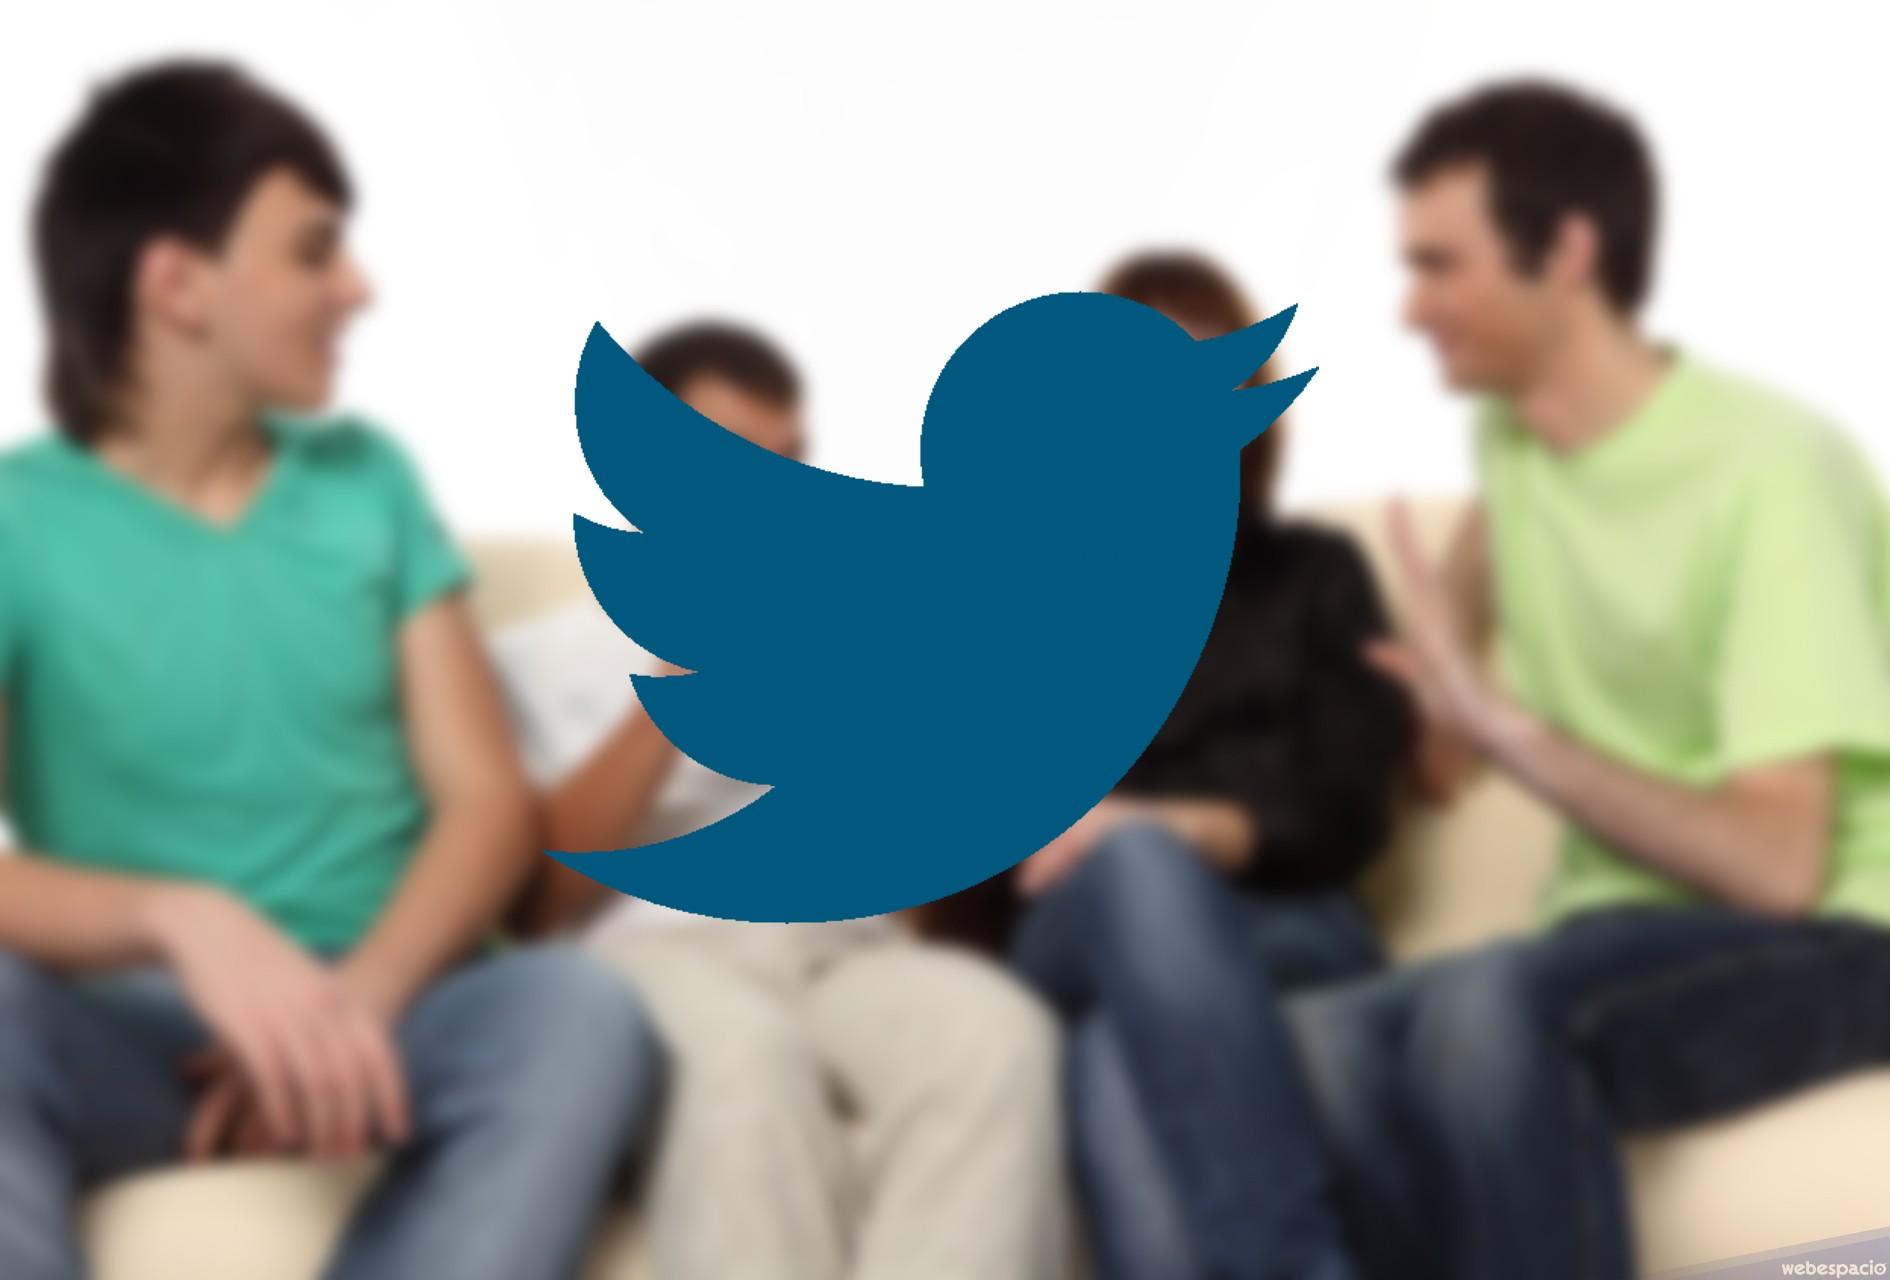 biografias entretenidas en twitter